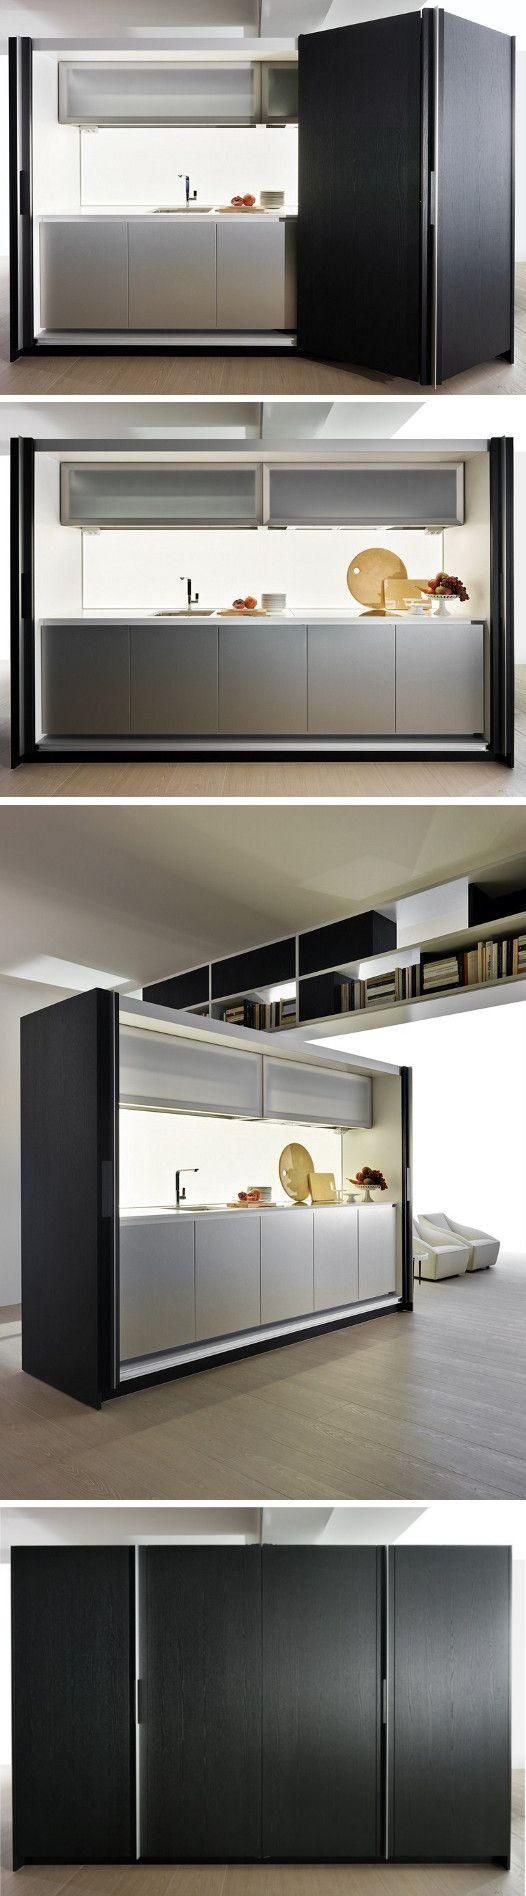 Hideaway linear kitchen TIVALÌ by DADA | #design Dante Bonuccelli @moltenidada